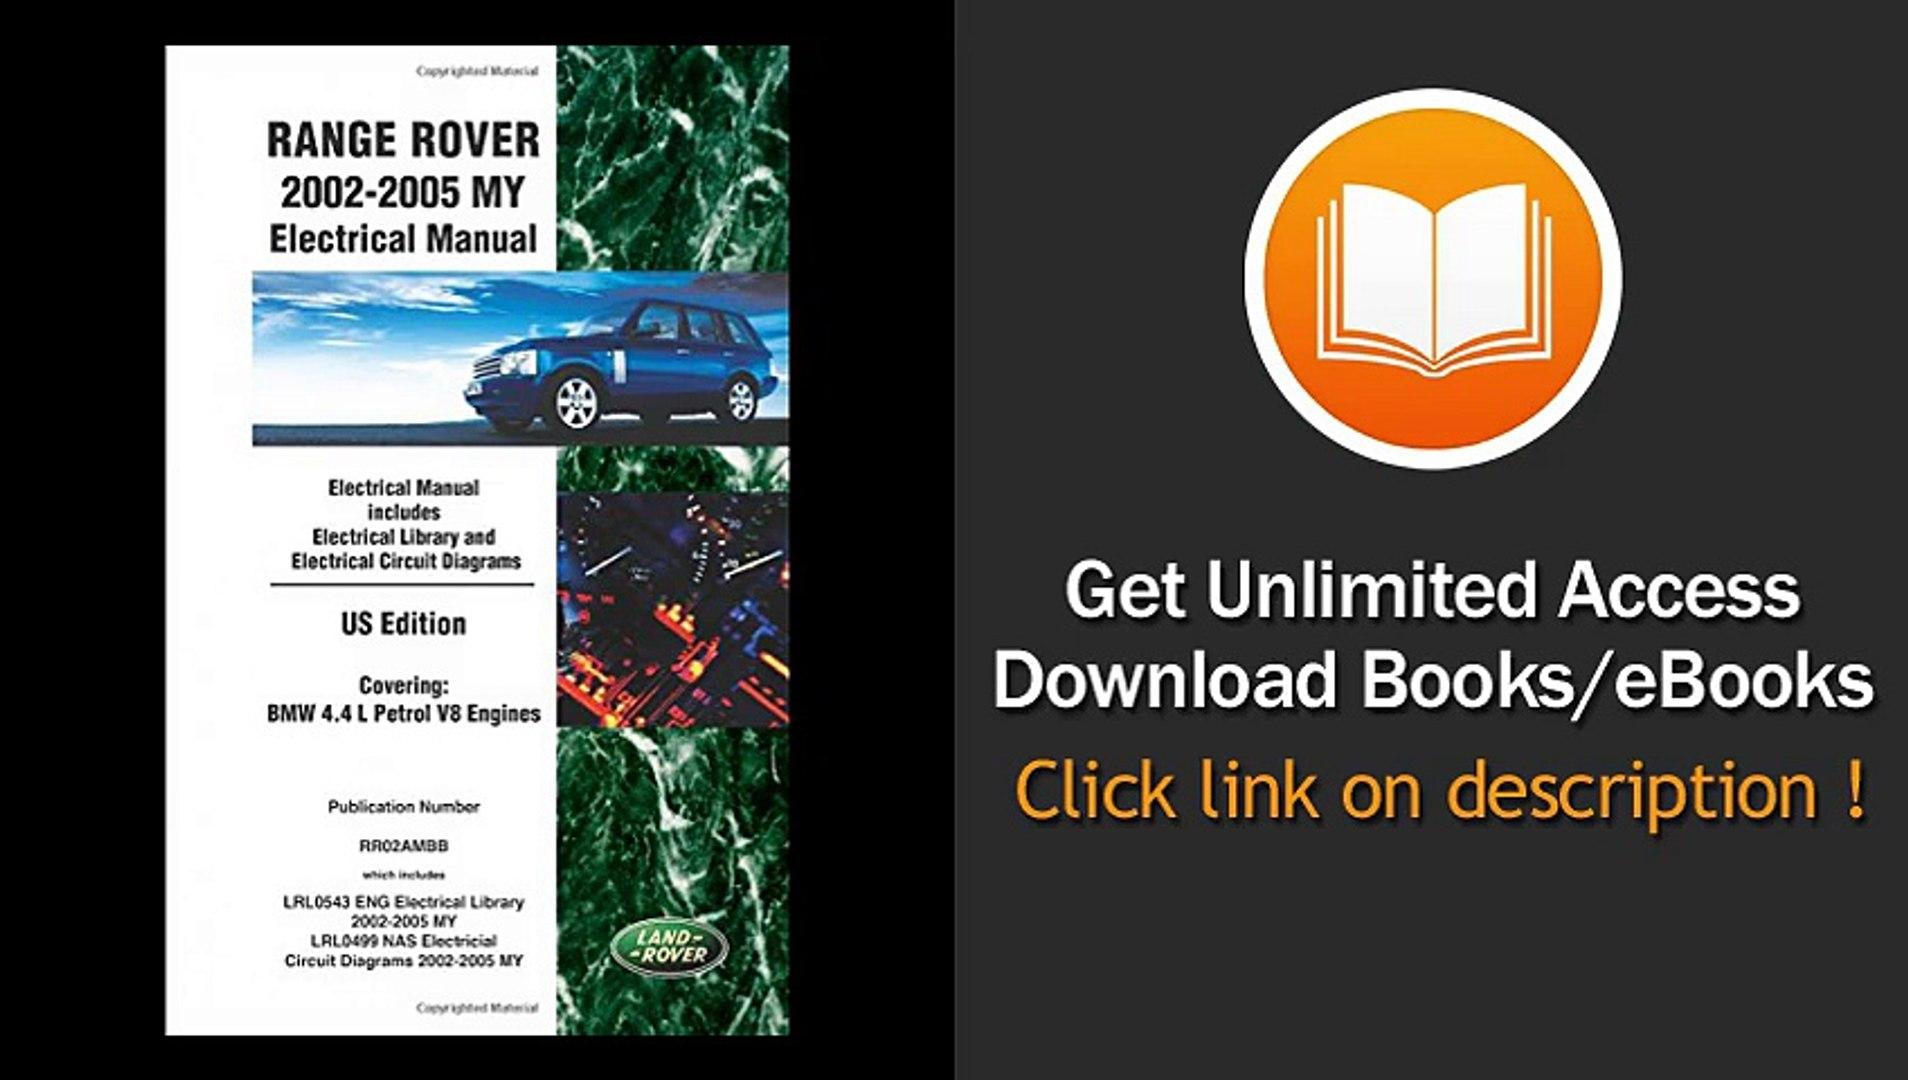 2005 range rover engine diagram download pdf  range rover 2002 2005 my electrical manual us  download pdf  range rover 2002 2005 my